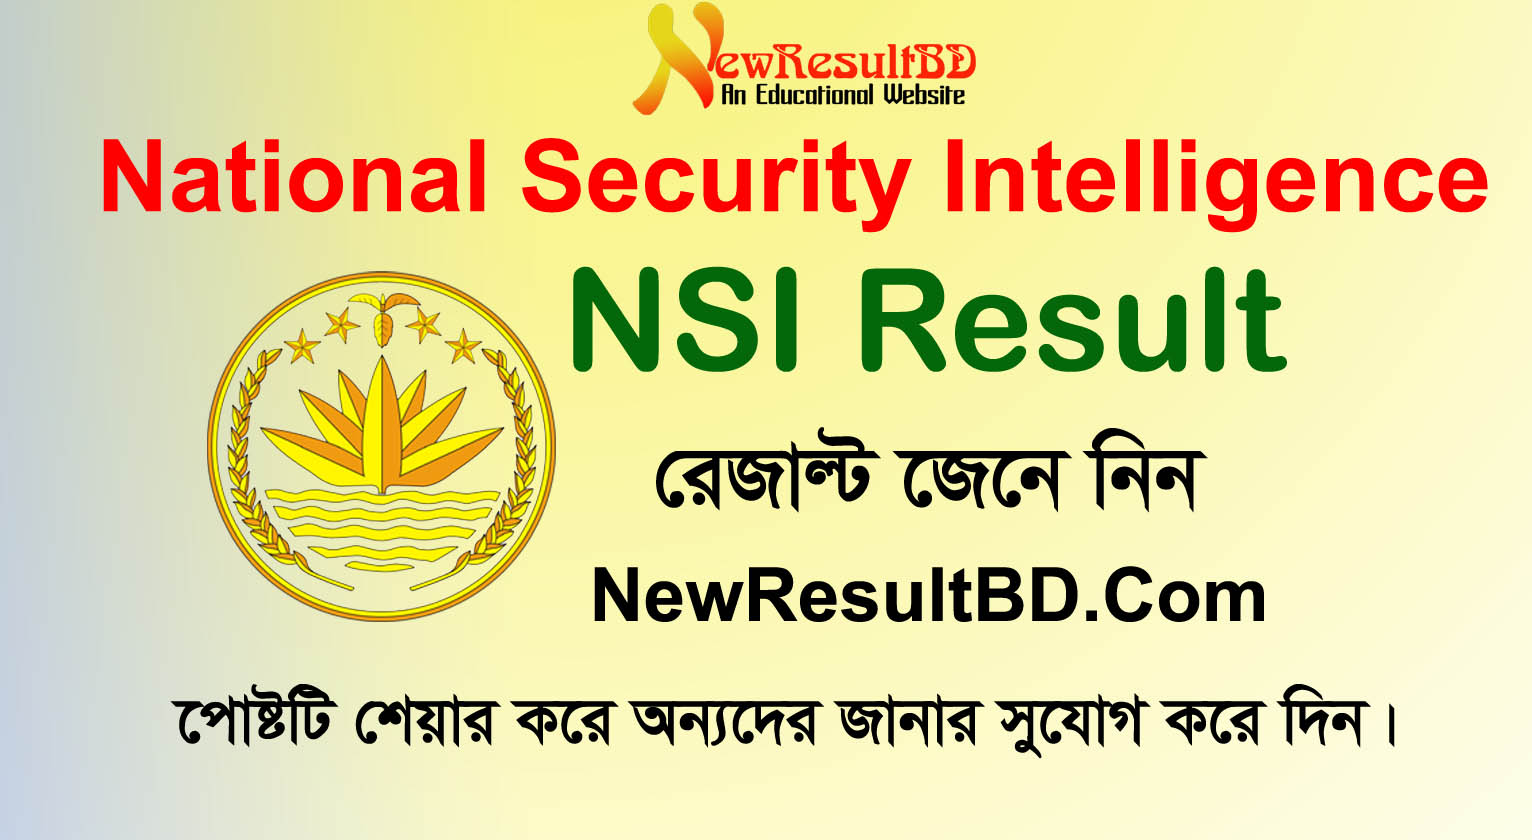 NSI Exam Result 2019, PMO's NSI Job Result, NSI Result PDF Download, nsi.teletalk.com.bd